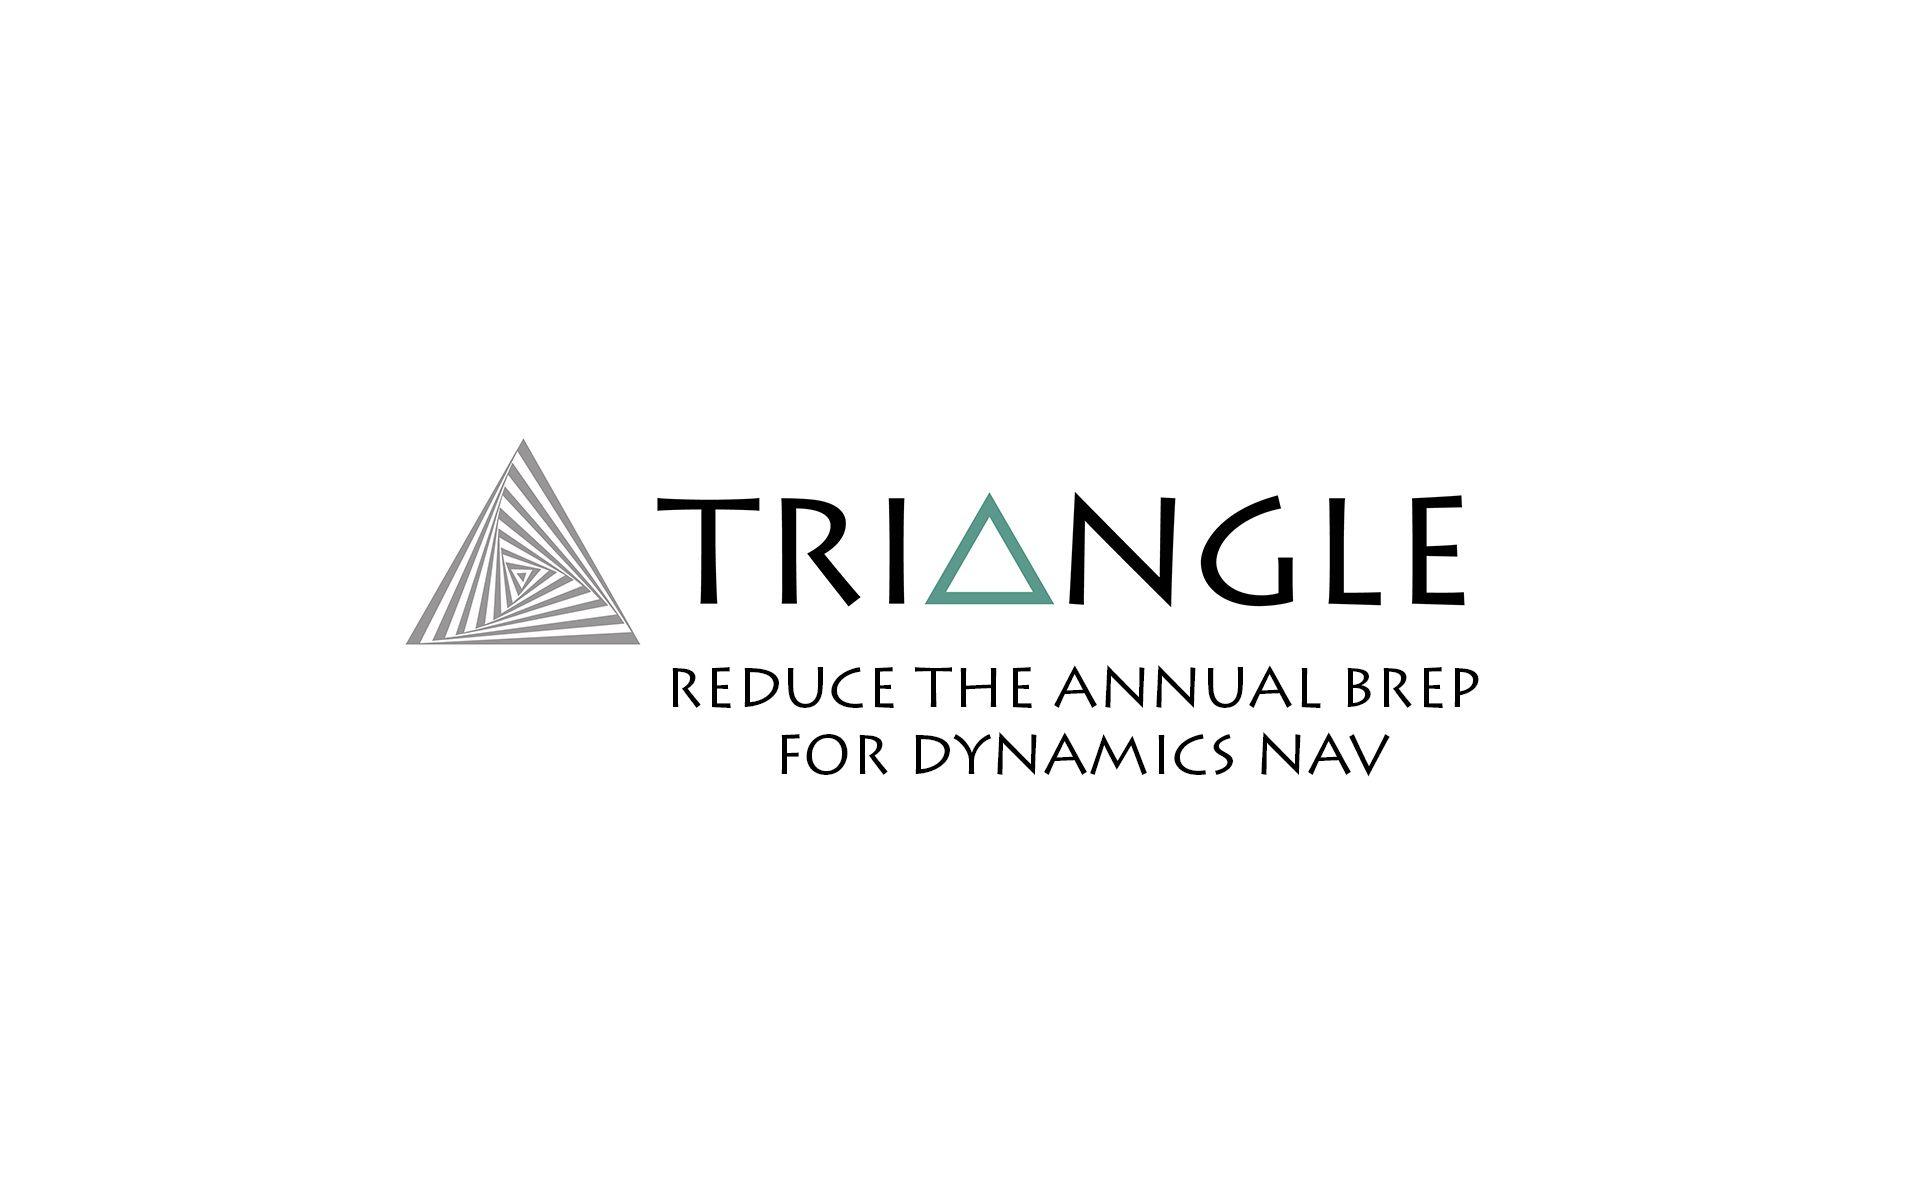 Reduce BREP Dynamics NAV